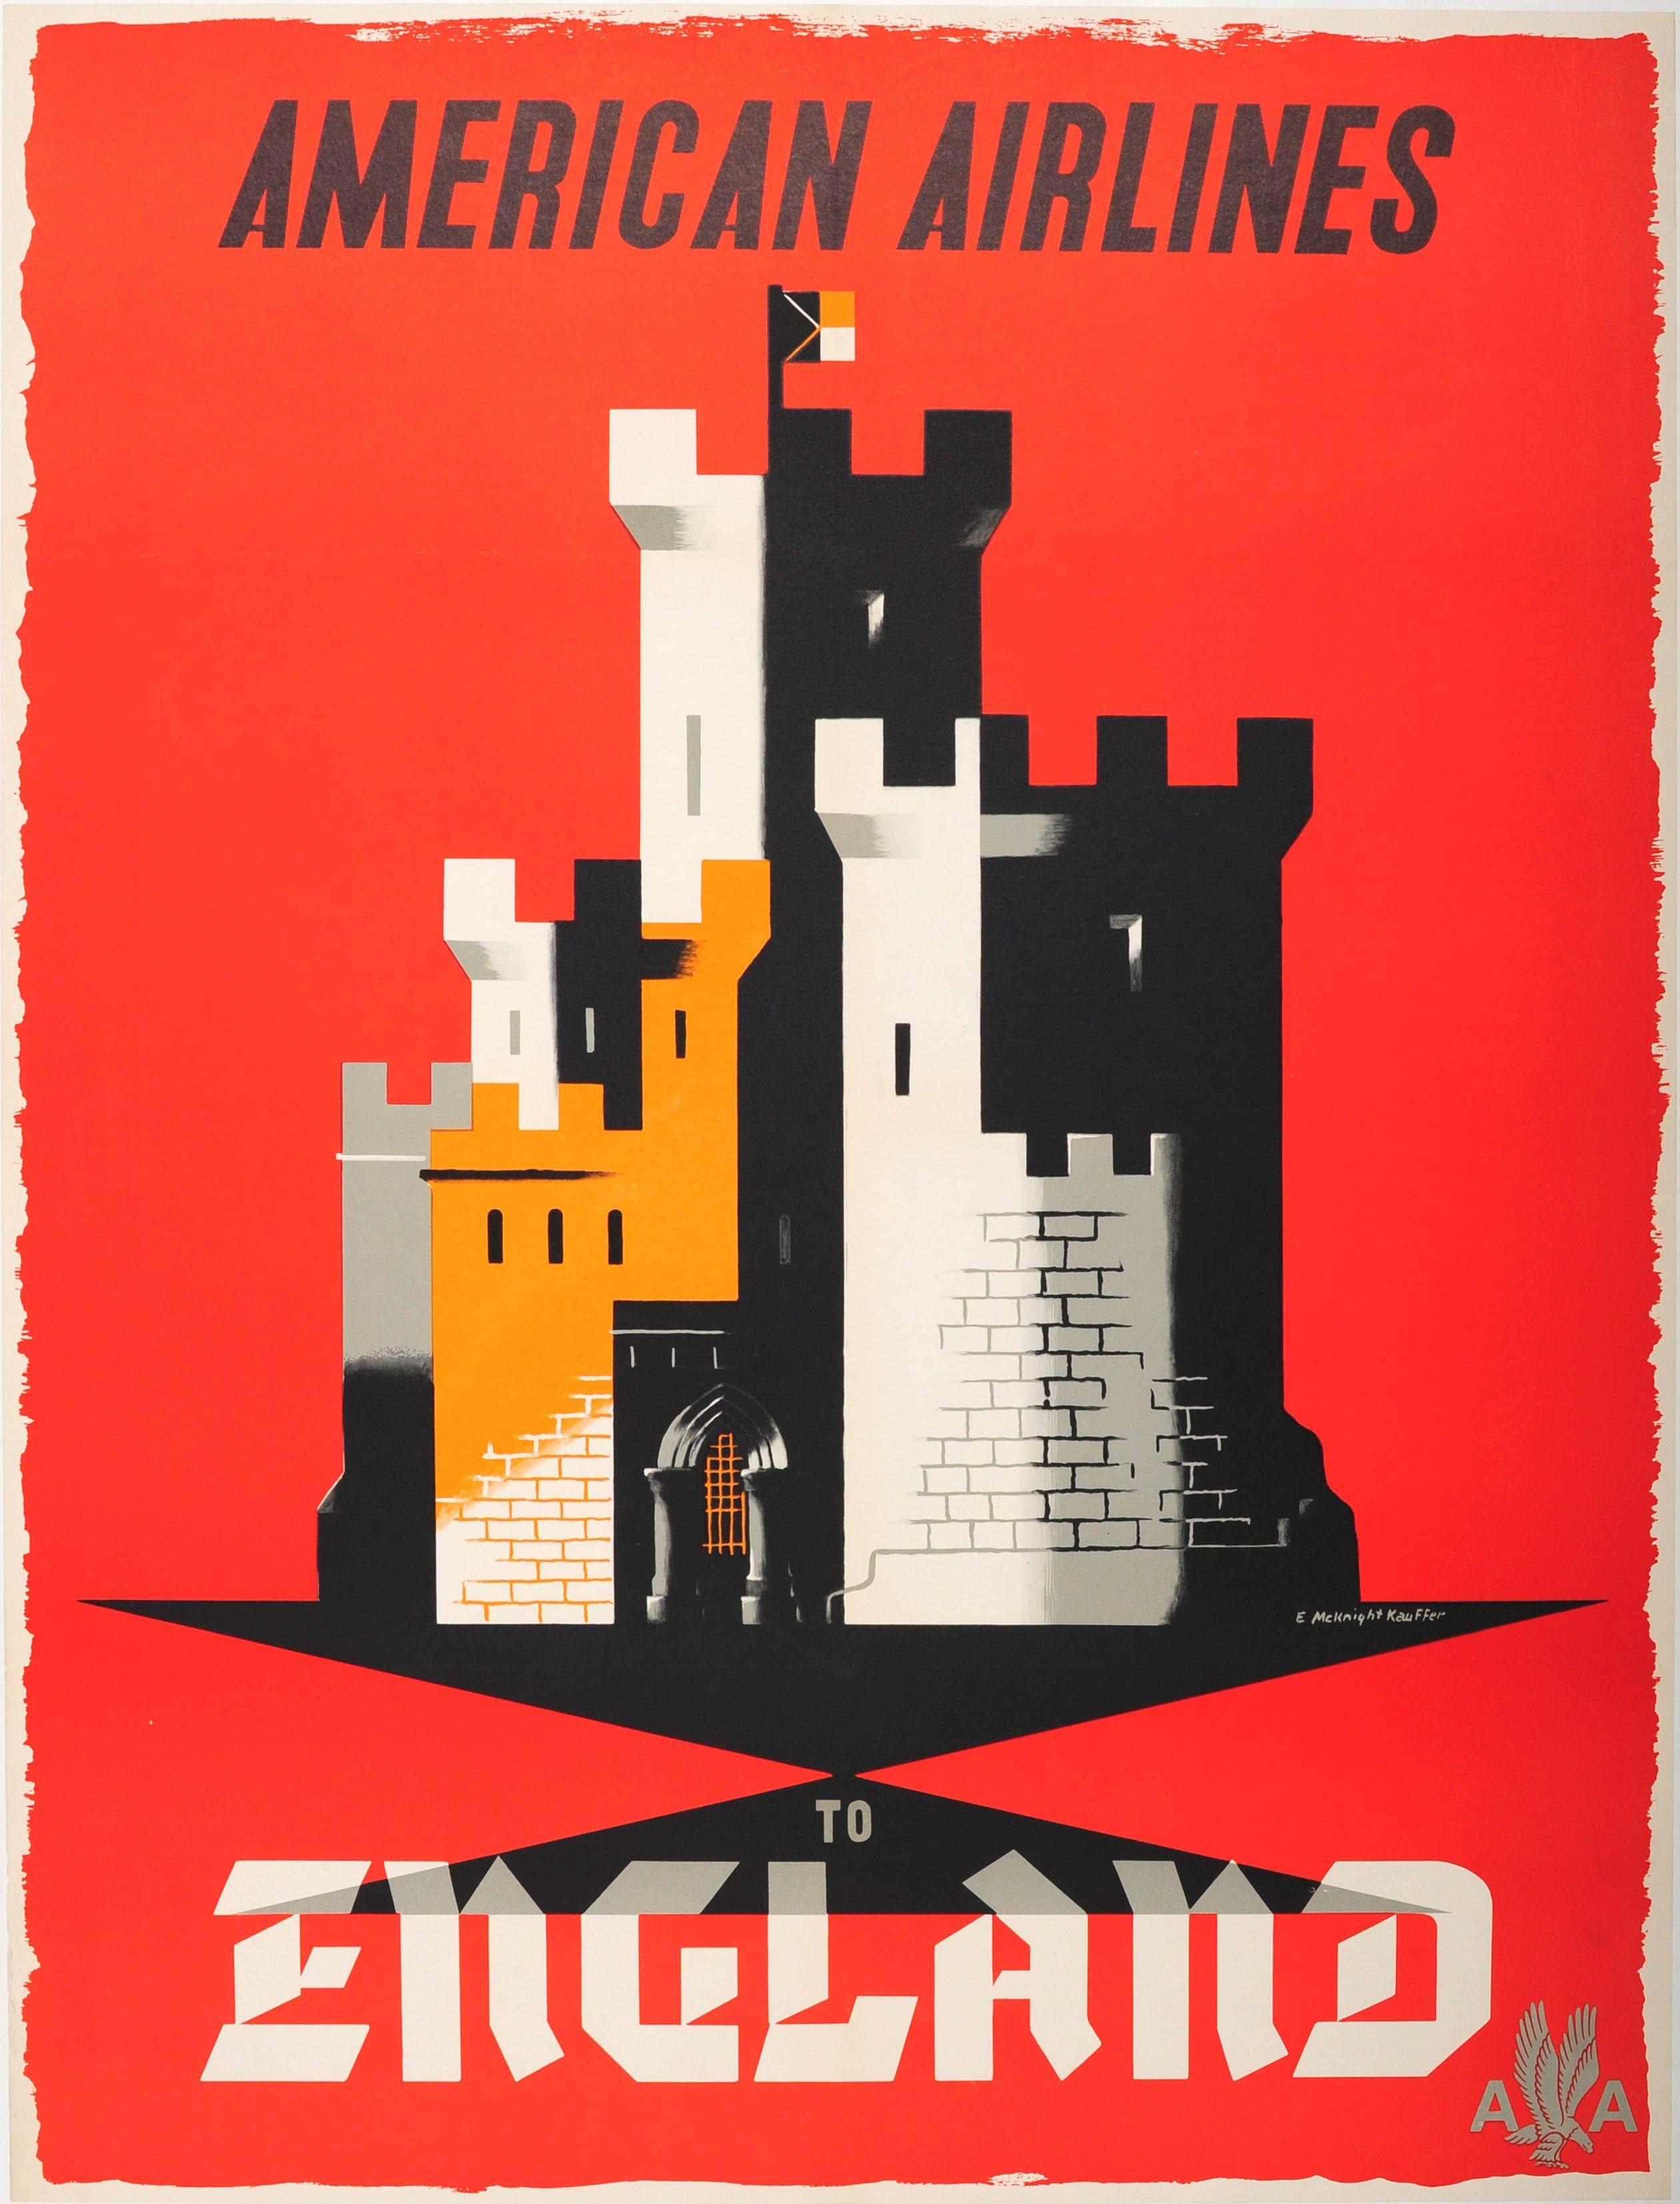 Tokyo Air India vintage air travel promo poster repro 16x24